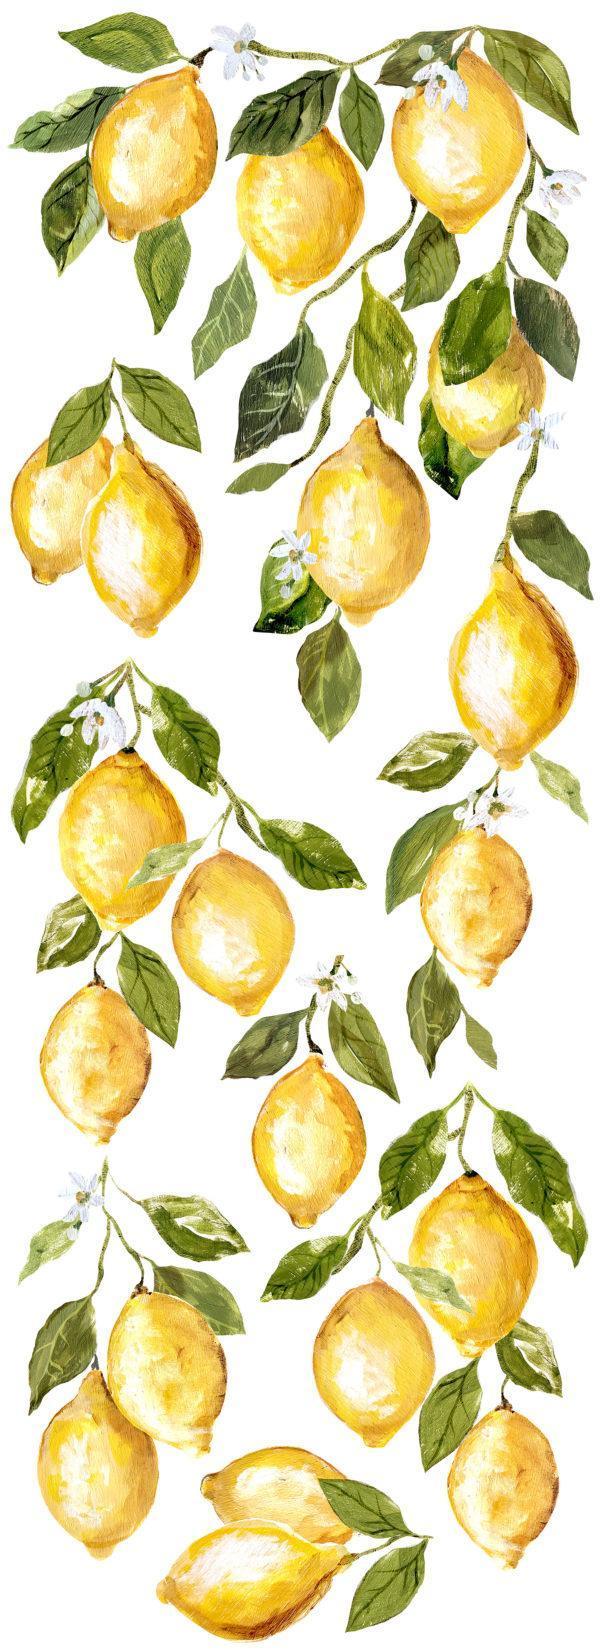 IOD DT Lemon Drops Preview DEC TRA LEM 600x1650 - My Shabby Chic Corner - Prodotti Iron Orchid Designs - IOD